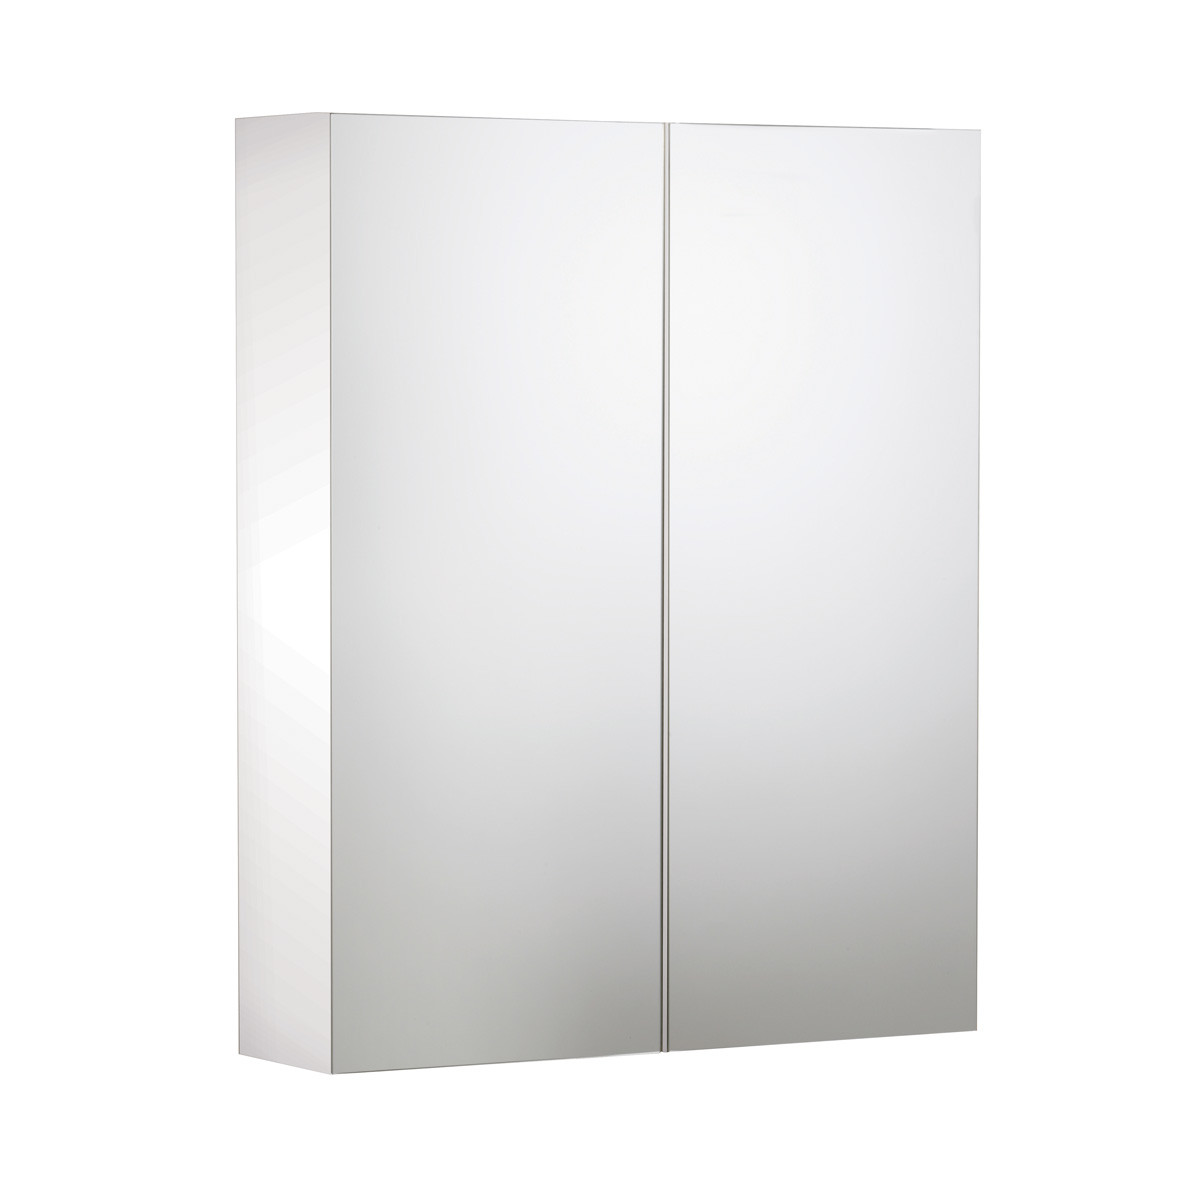 roper rhodes signatures 600mm bathroom cabinet white finish